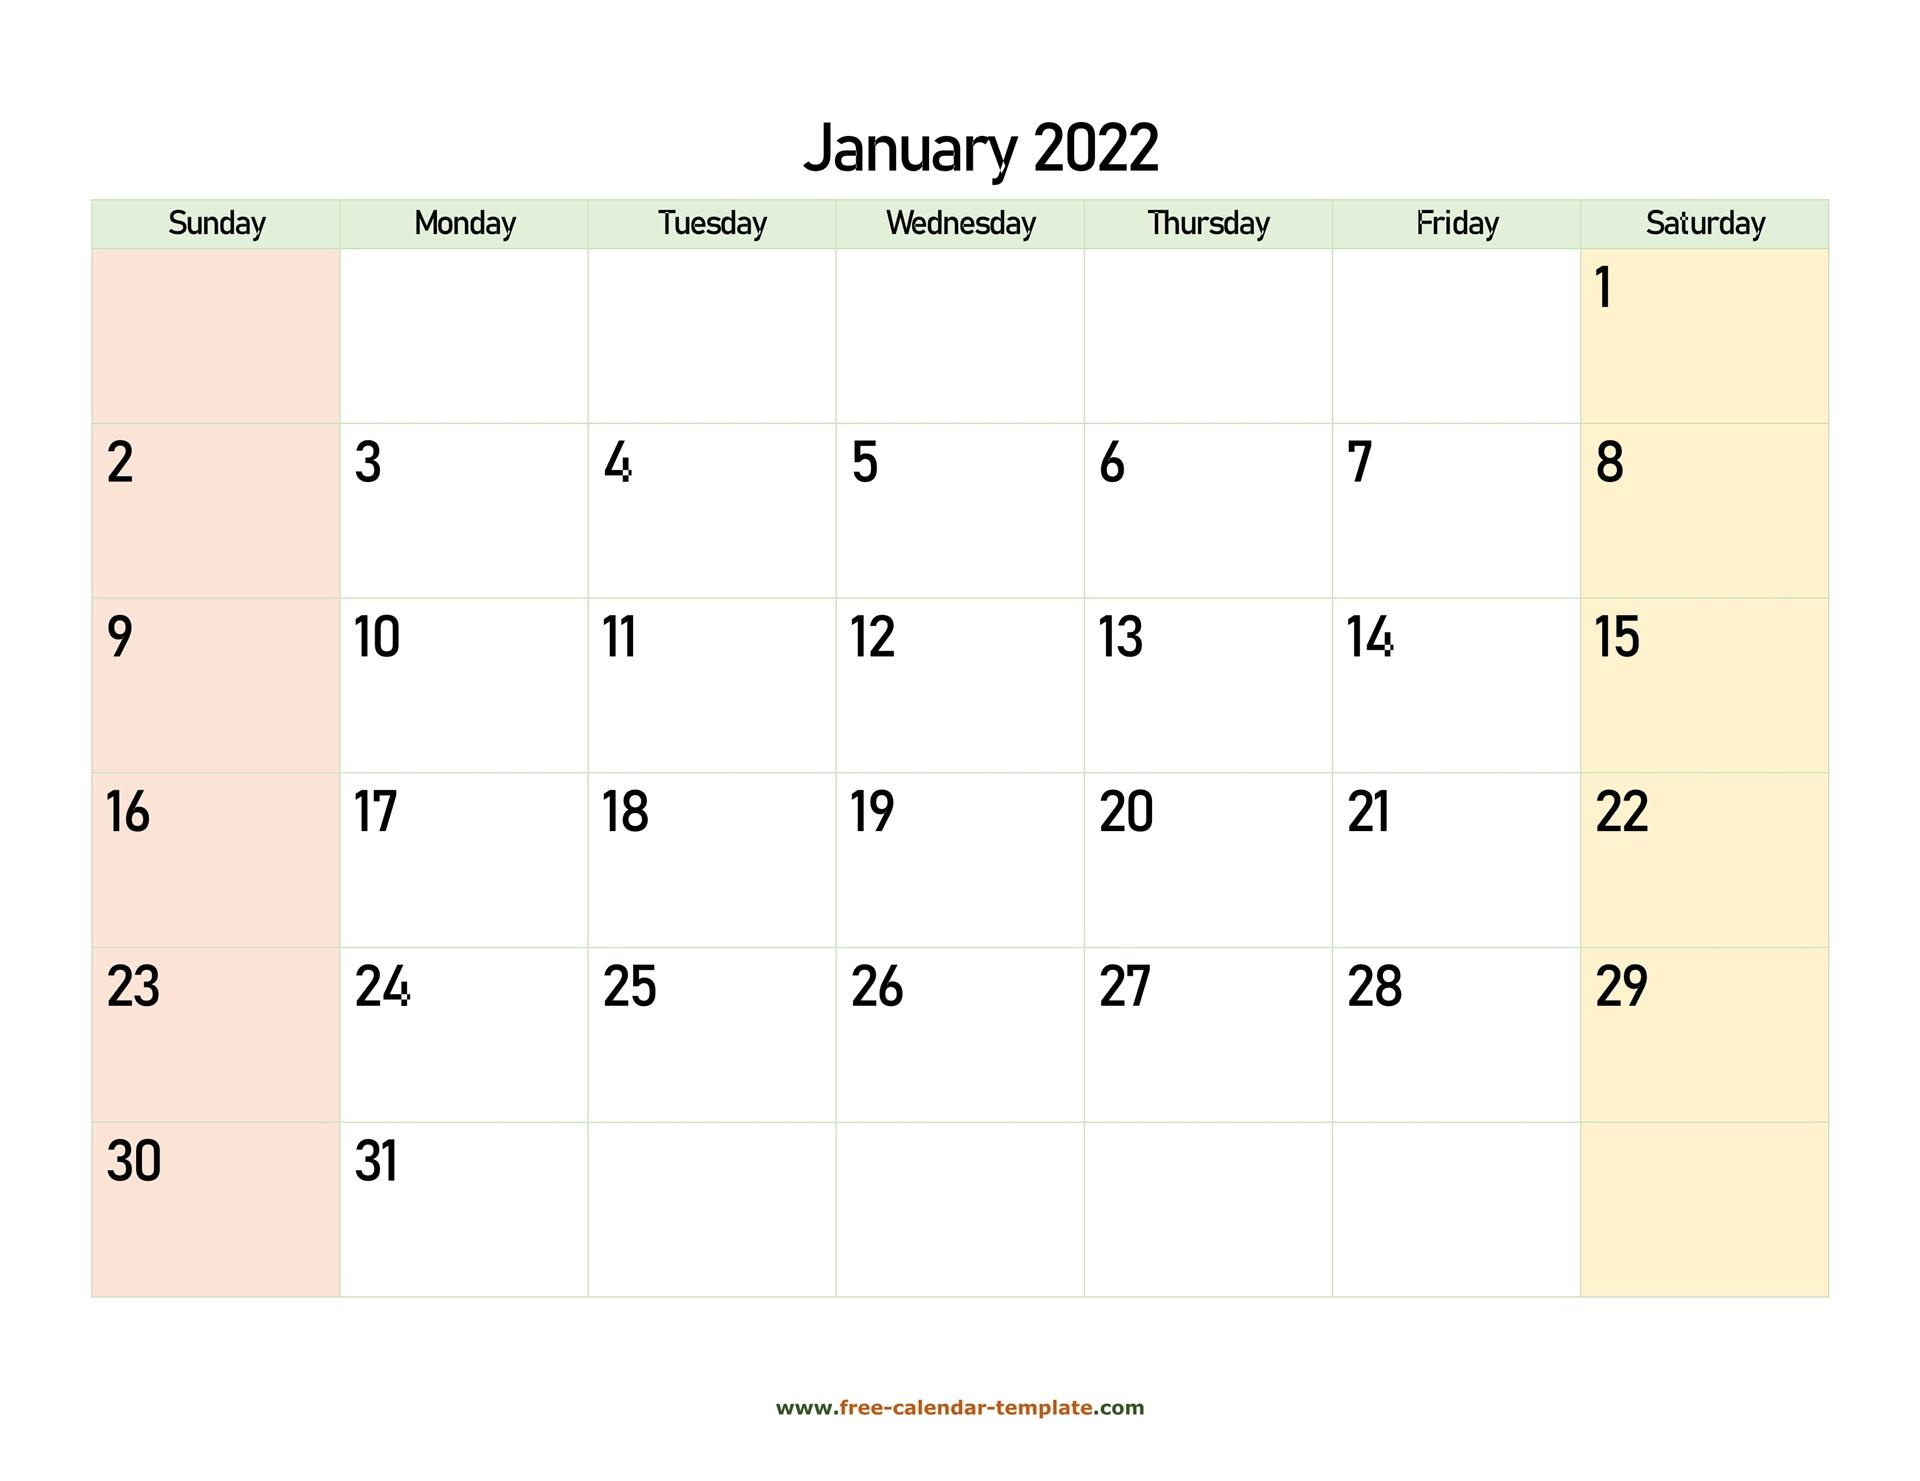 January 2022 Free Calendar Tempplate   Free-Calendar in January 2022 Calendar Printable Pdf